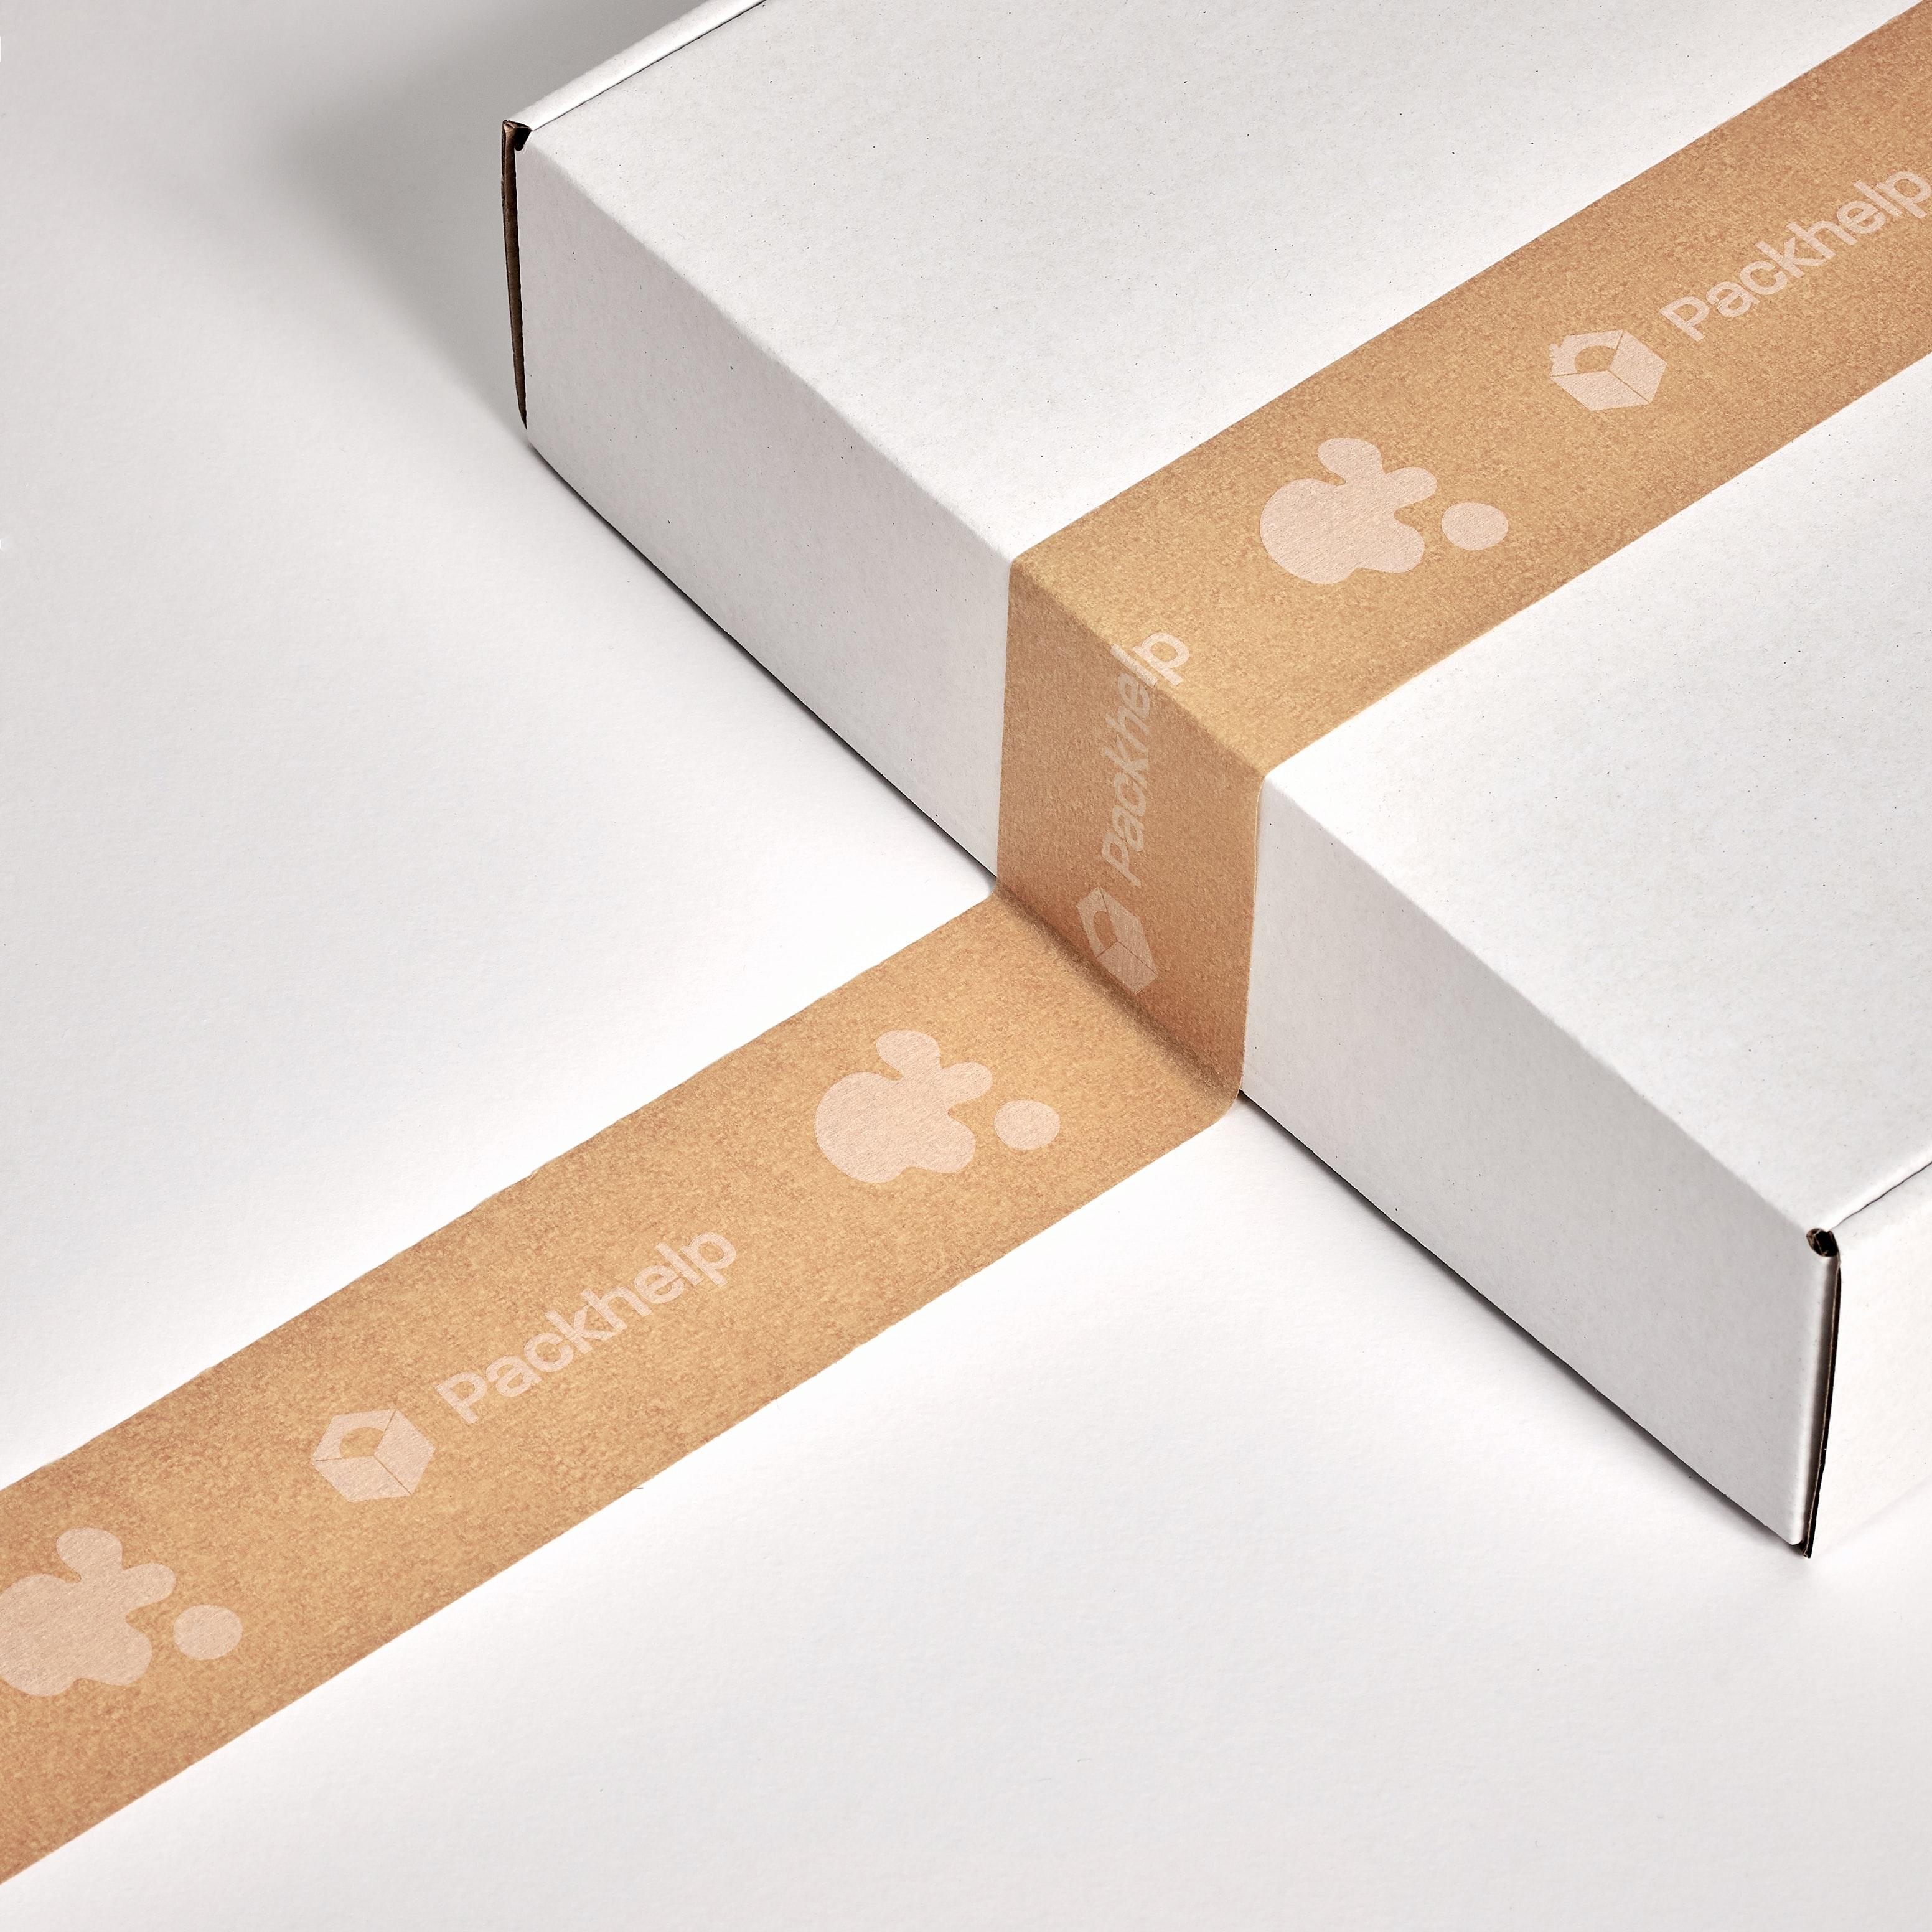 cinta adhesiva de Packhelp